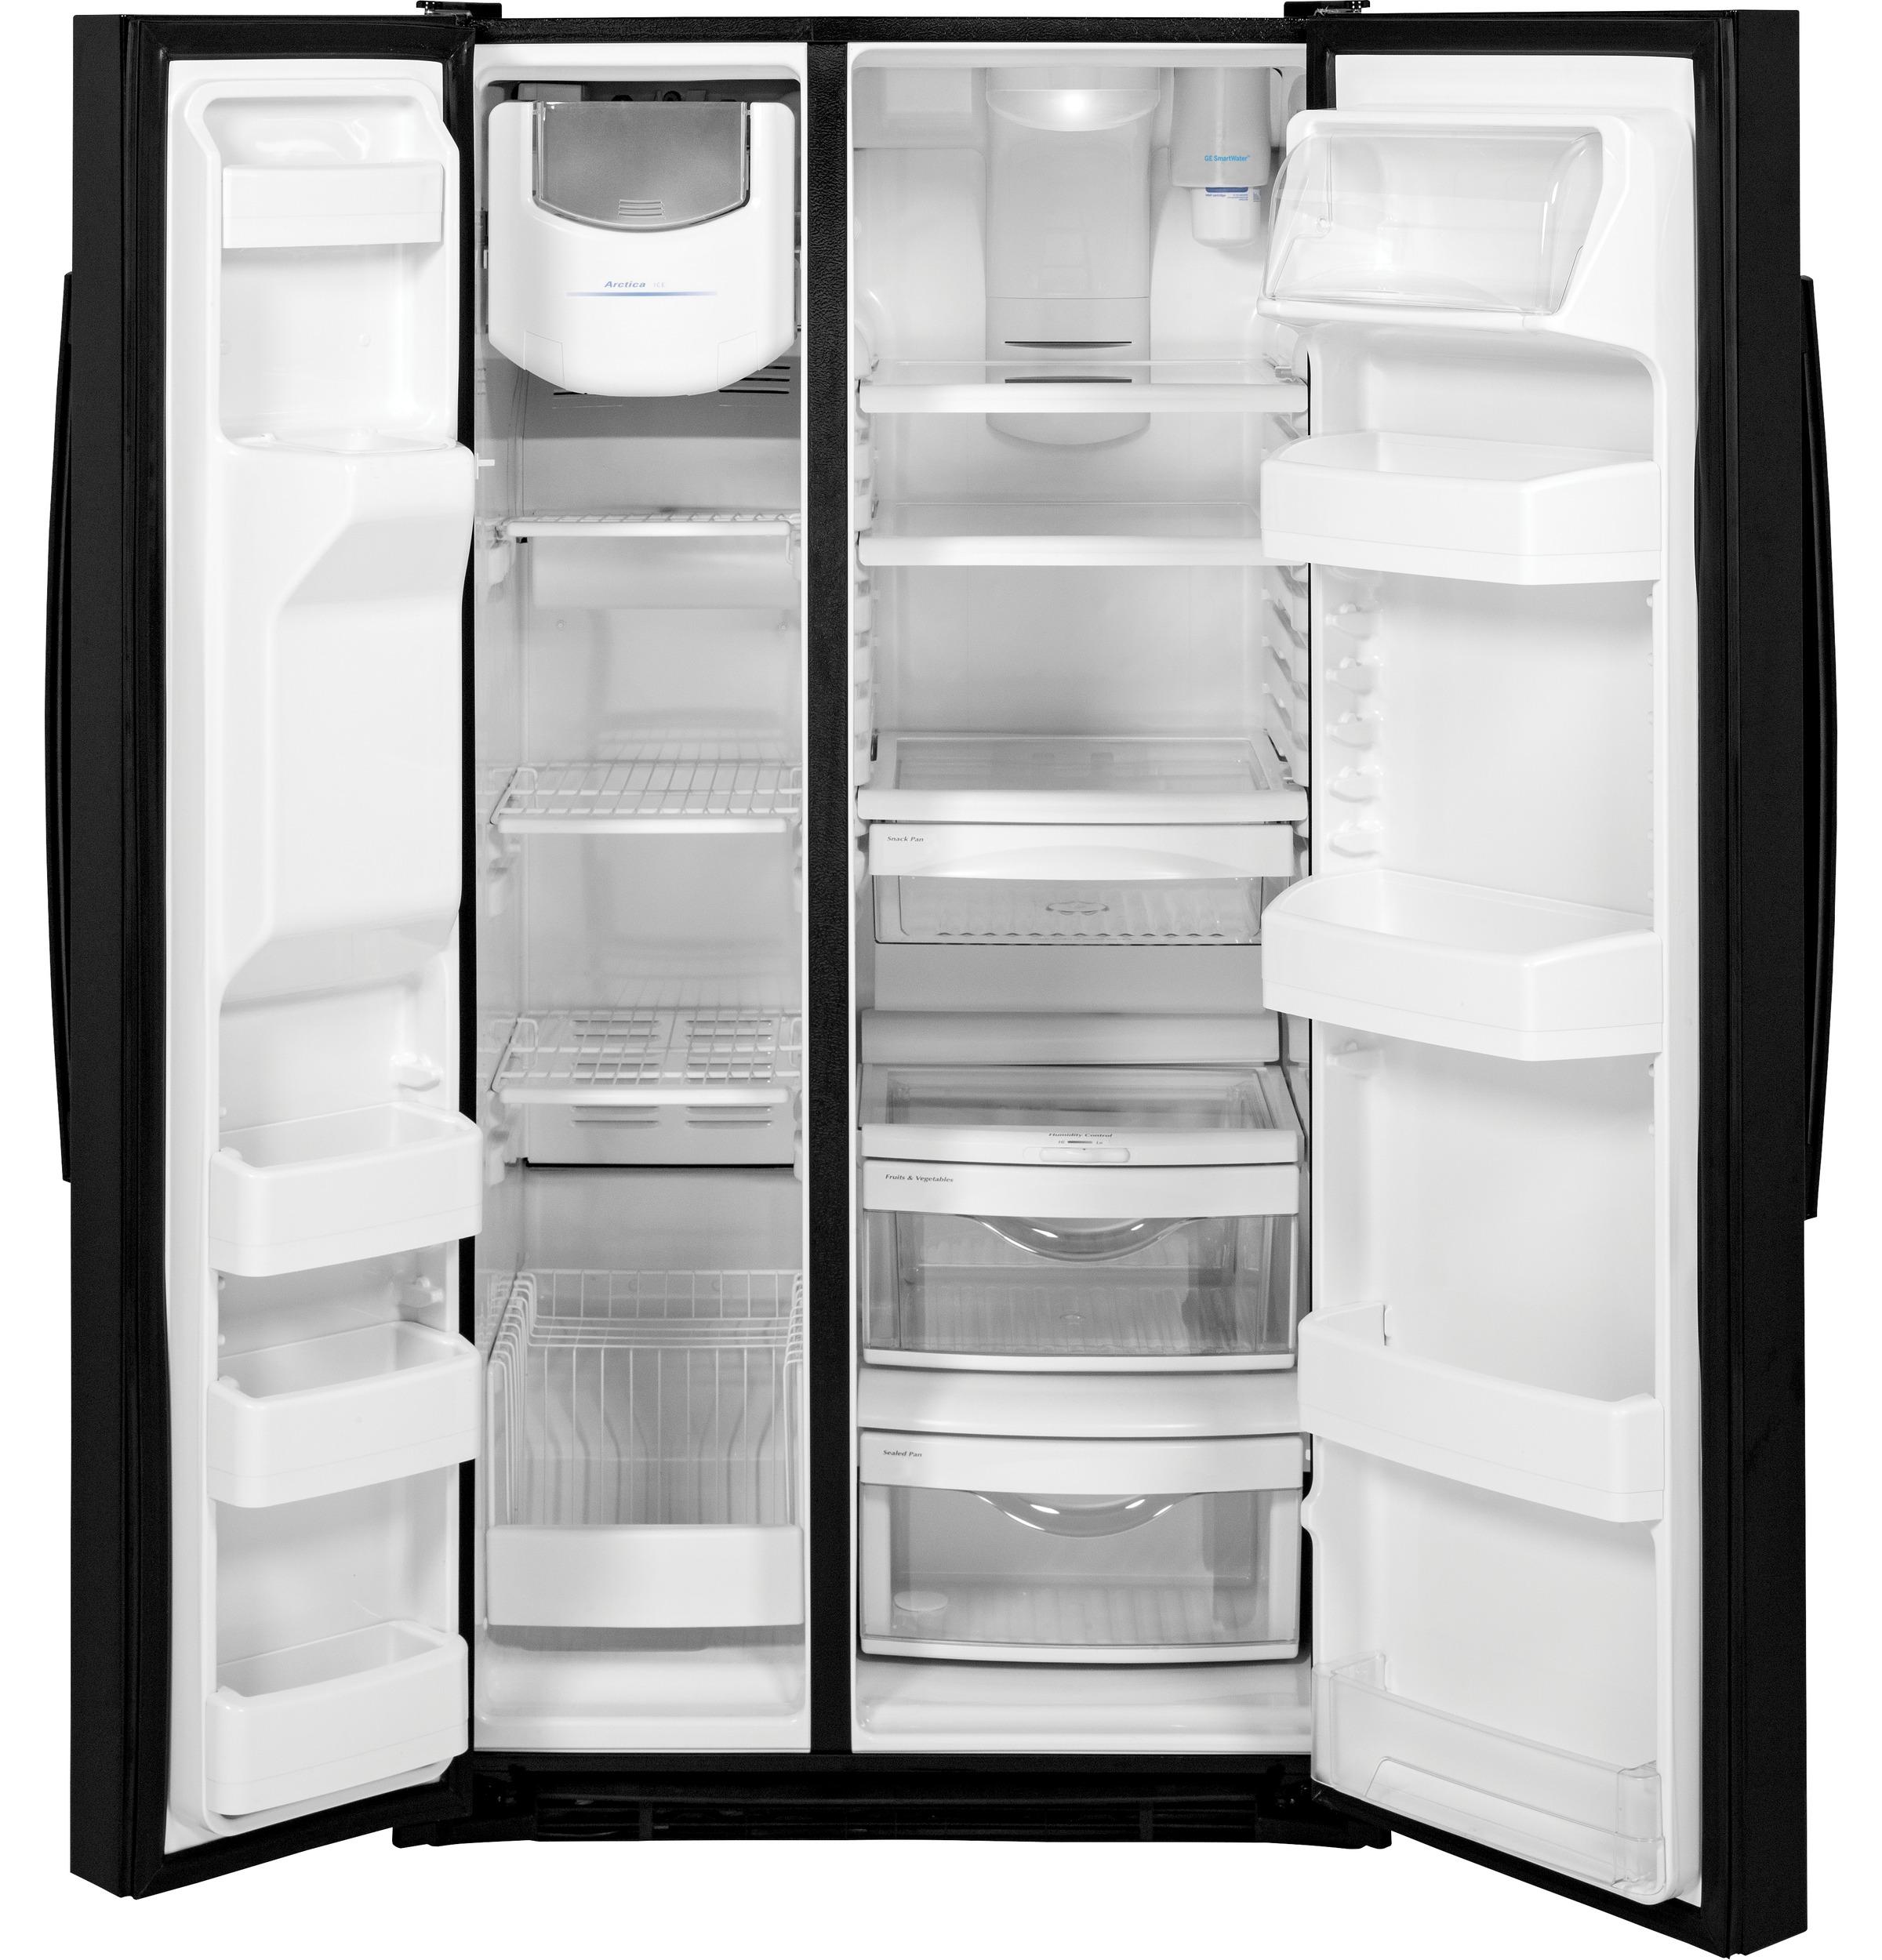 GE Appliances GSS25GGHBB 25.4 cu. ft. Side-By-Side Refrigerator - Black